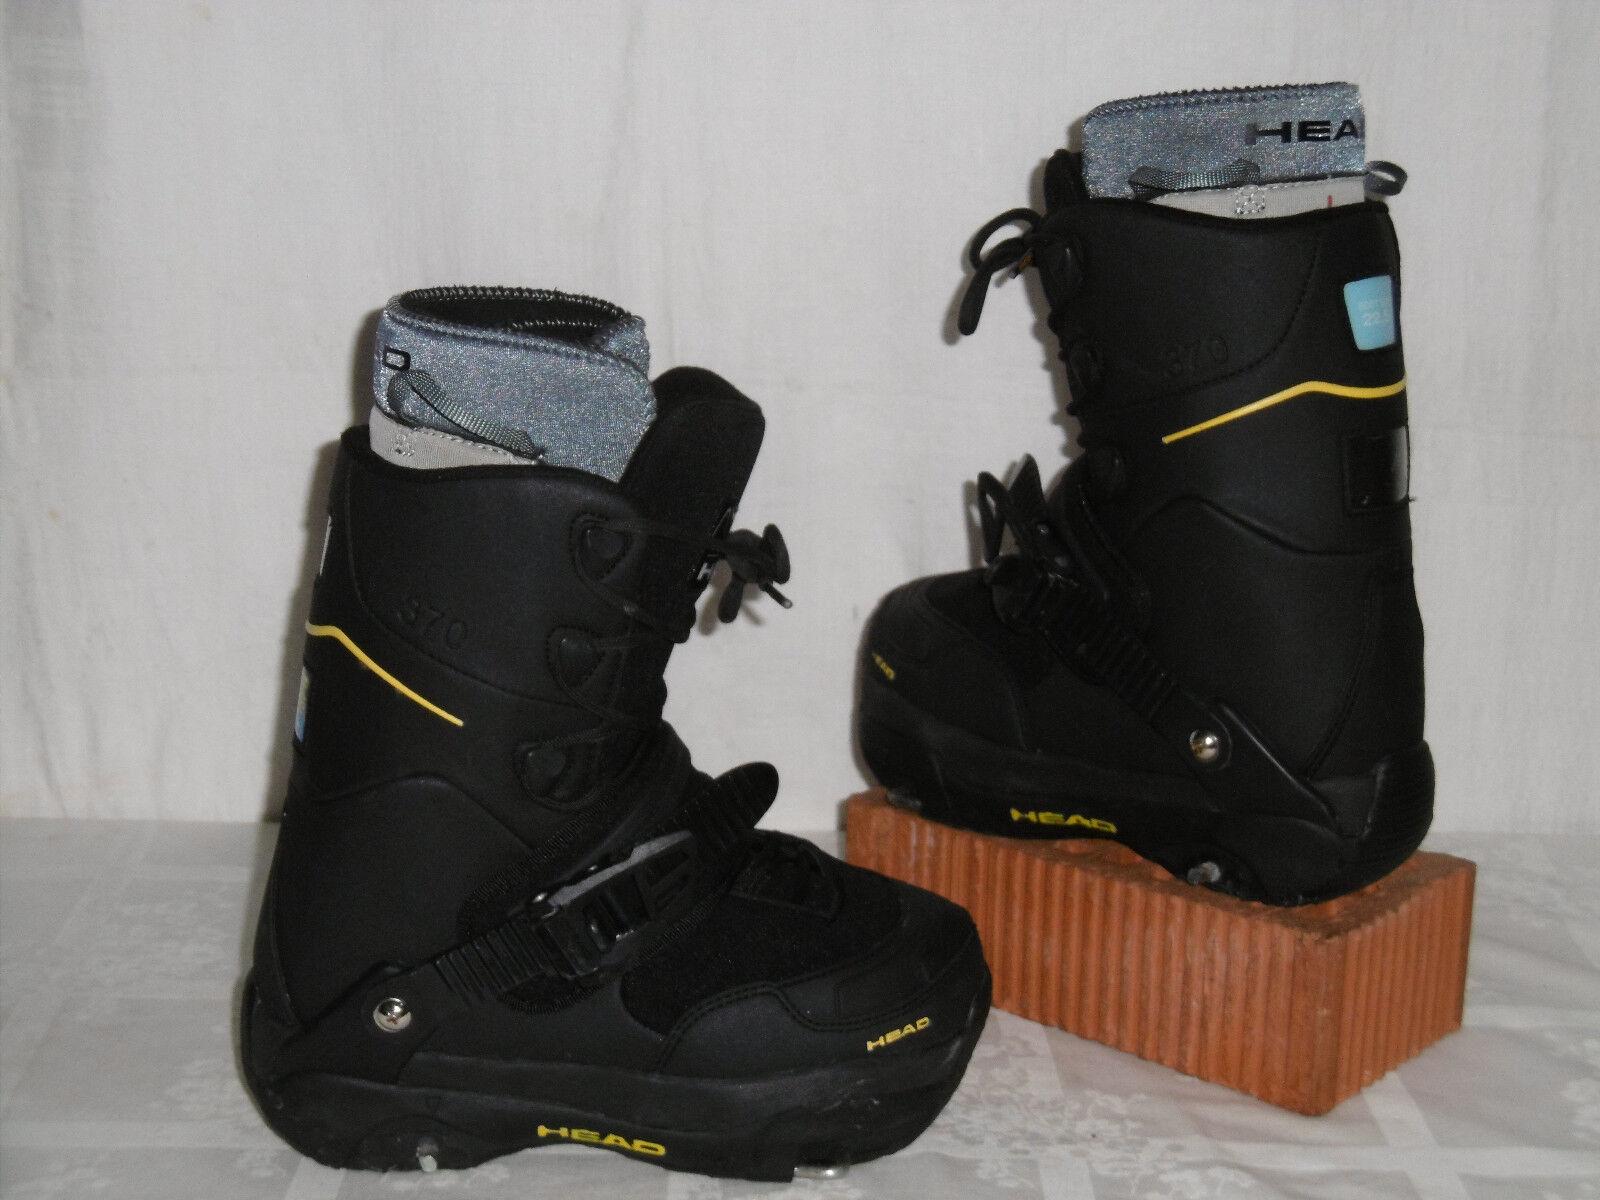 HEAD   370 370 370   JUNIOR SNOWBOARD STEP-IN Stiefel GR  35 + HEAD STEP-IN BINDUNG ee10db